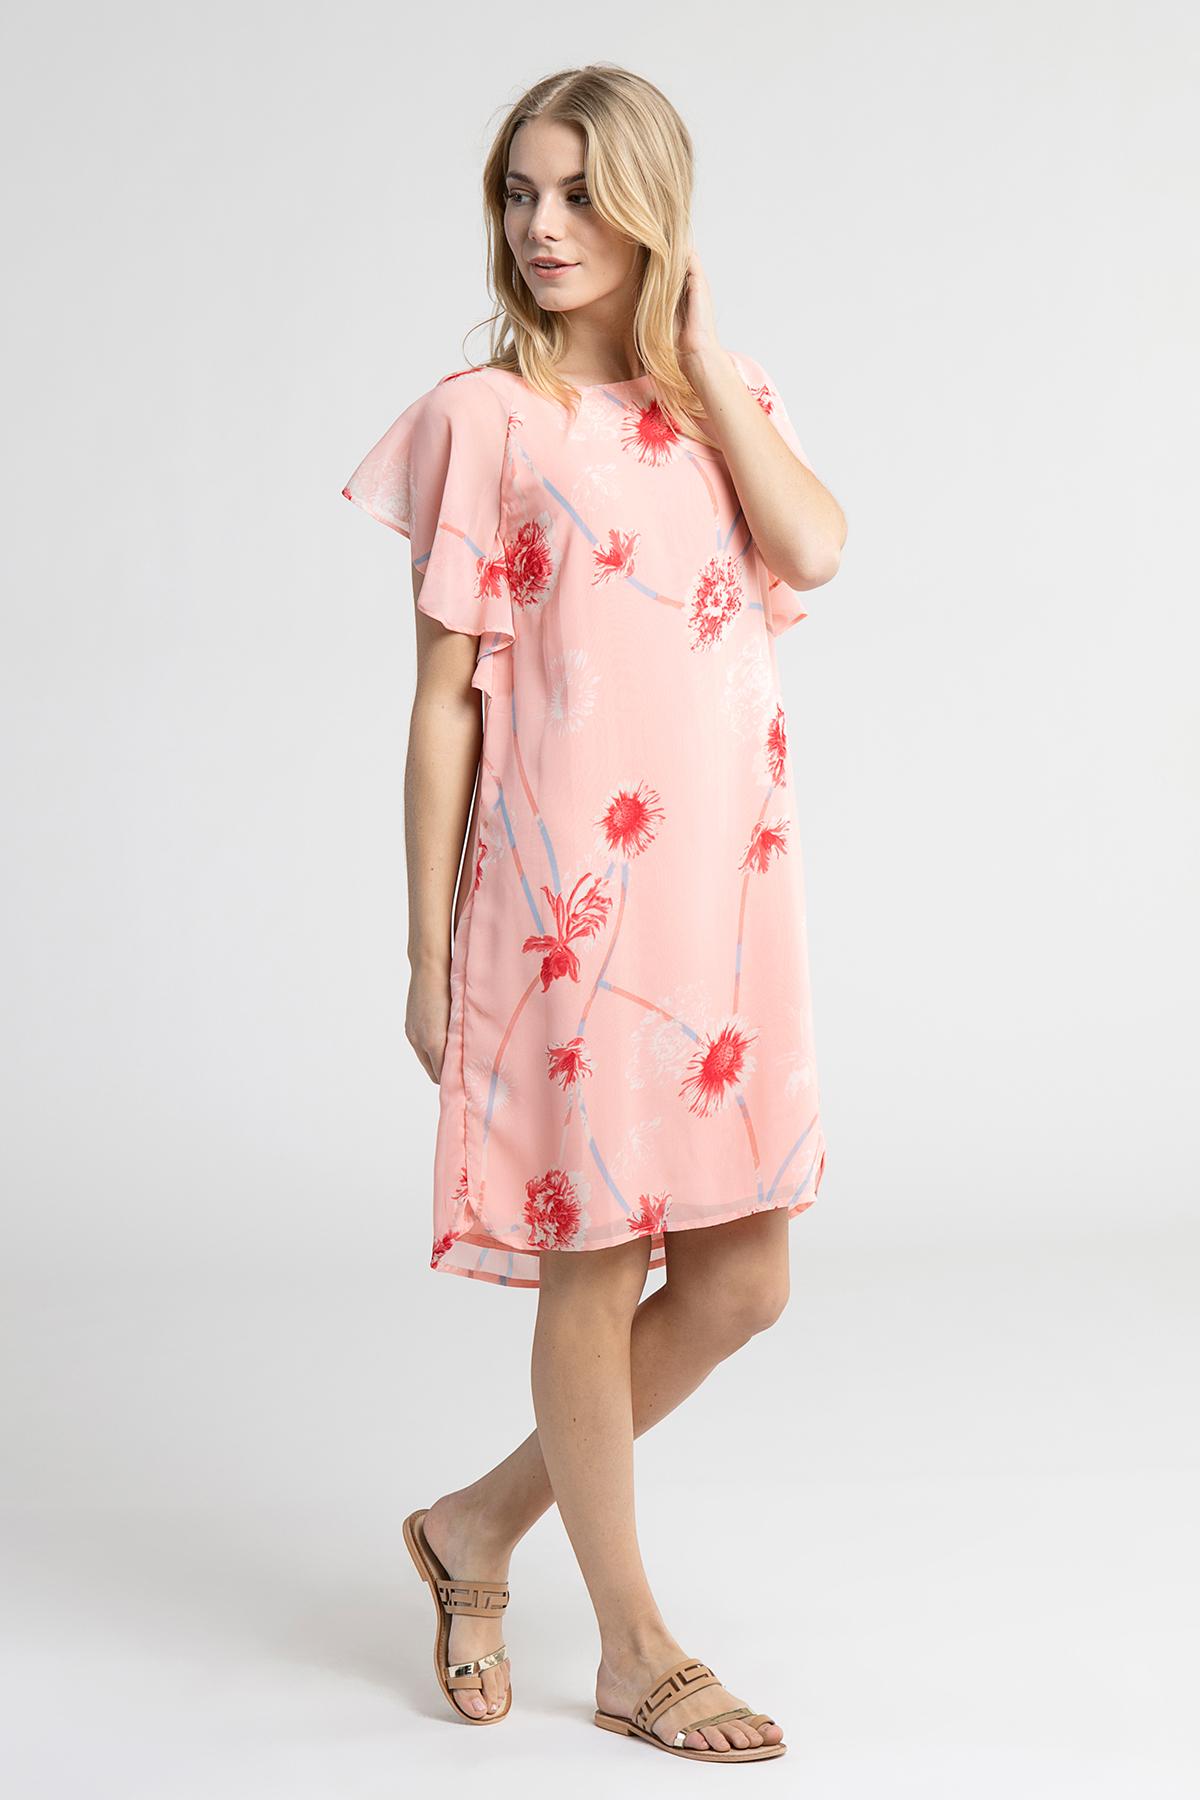 Roze/koraal